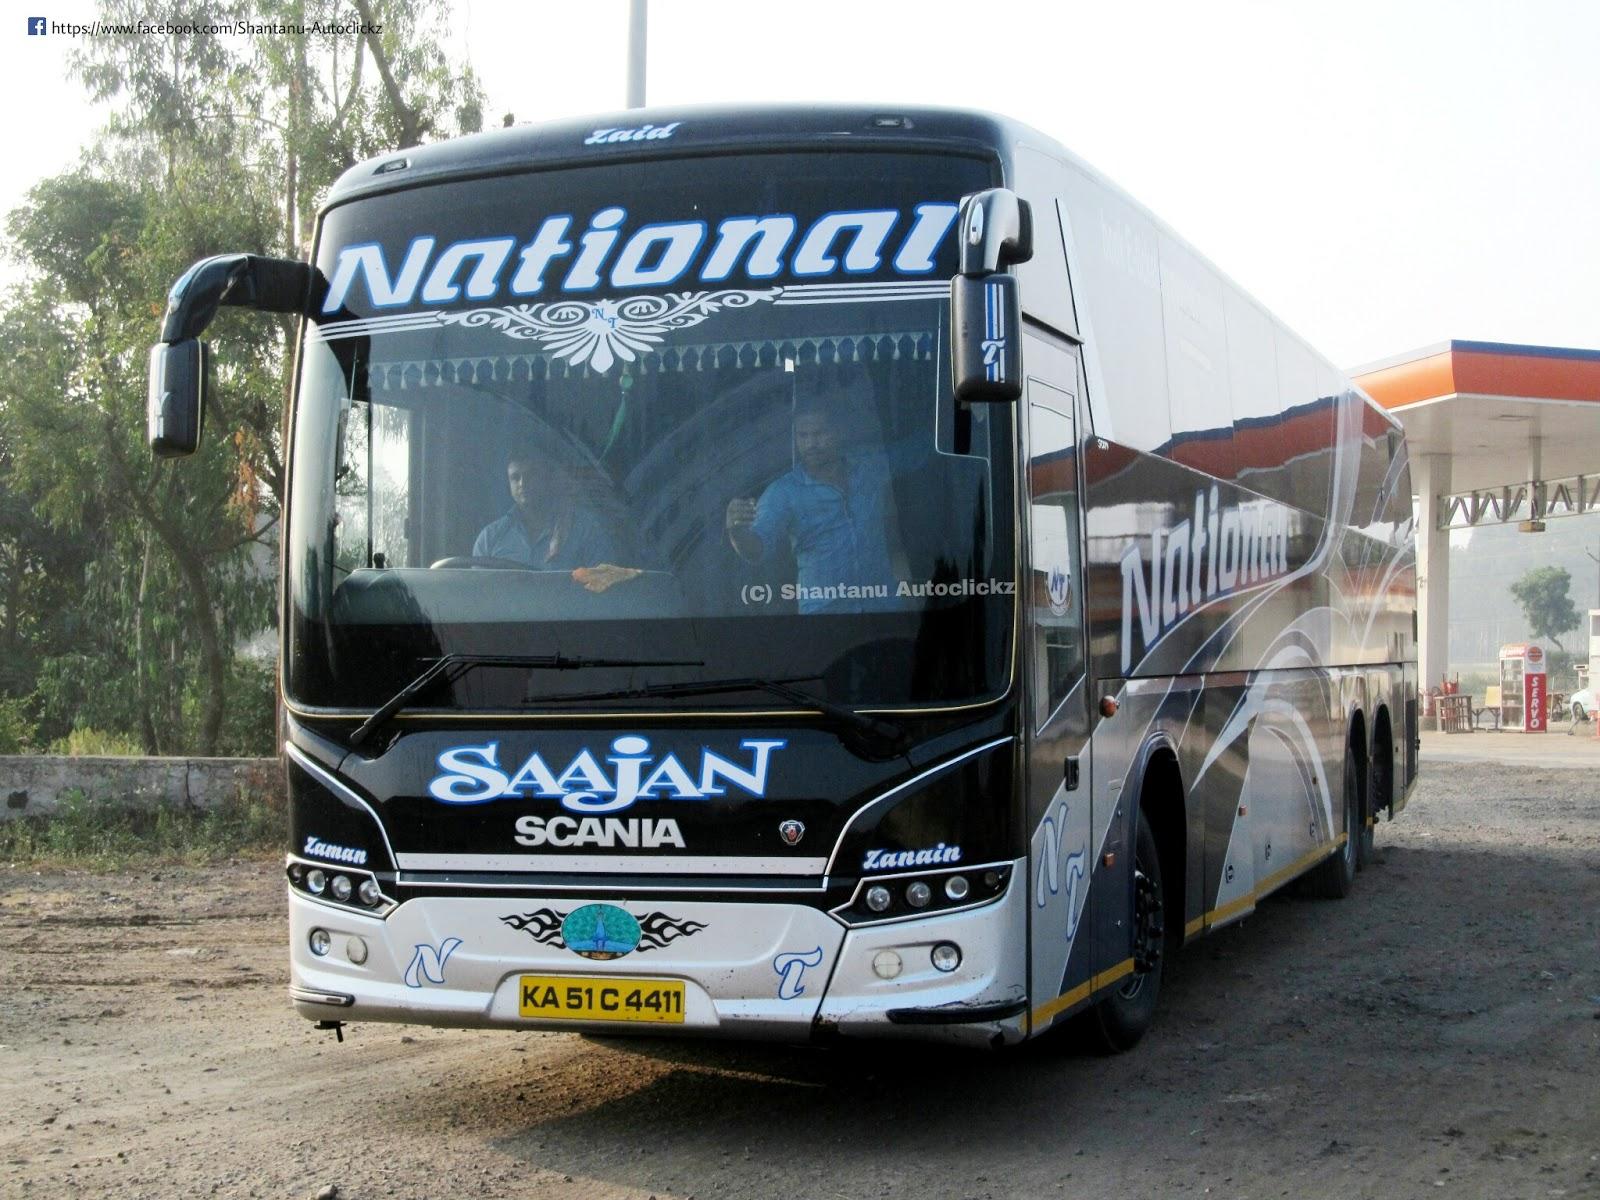 Shantanu Autoclickz National Travels Bangalore Scania Saajan